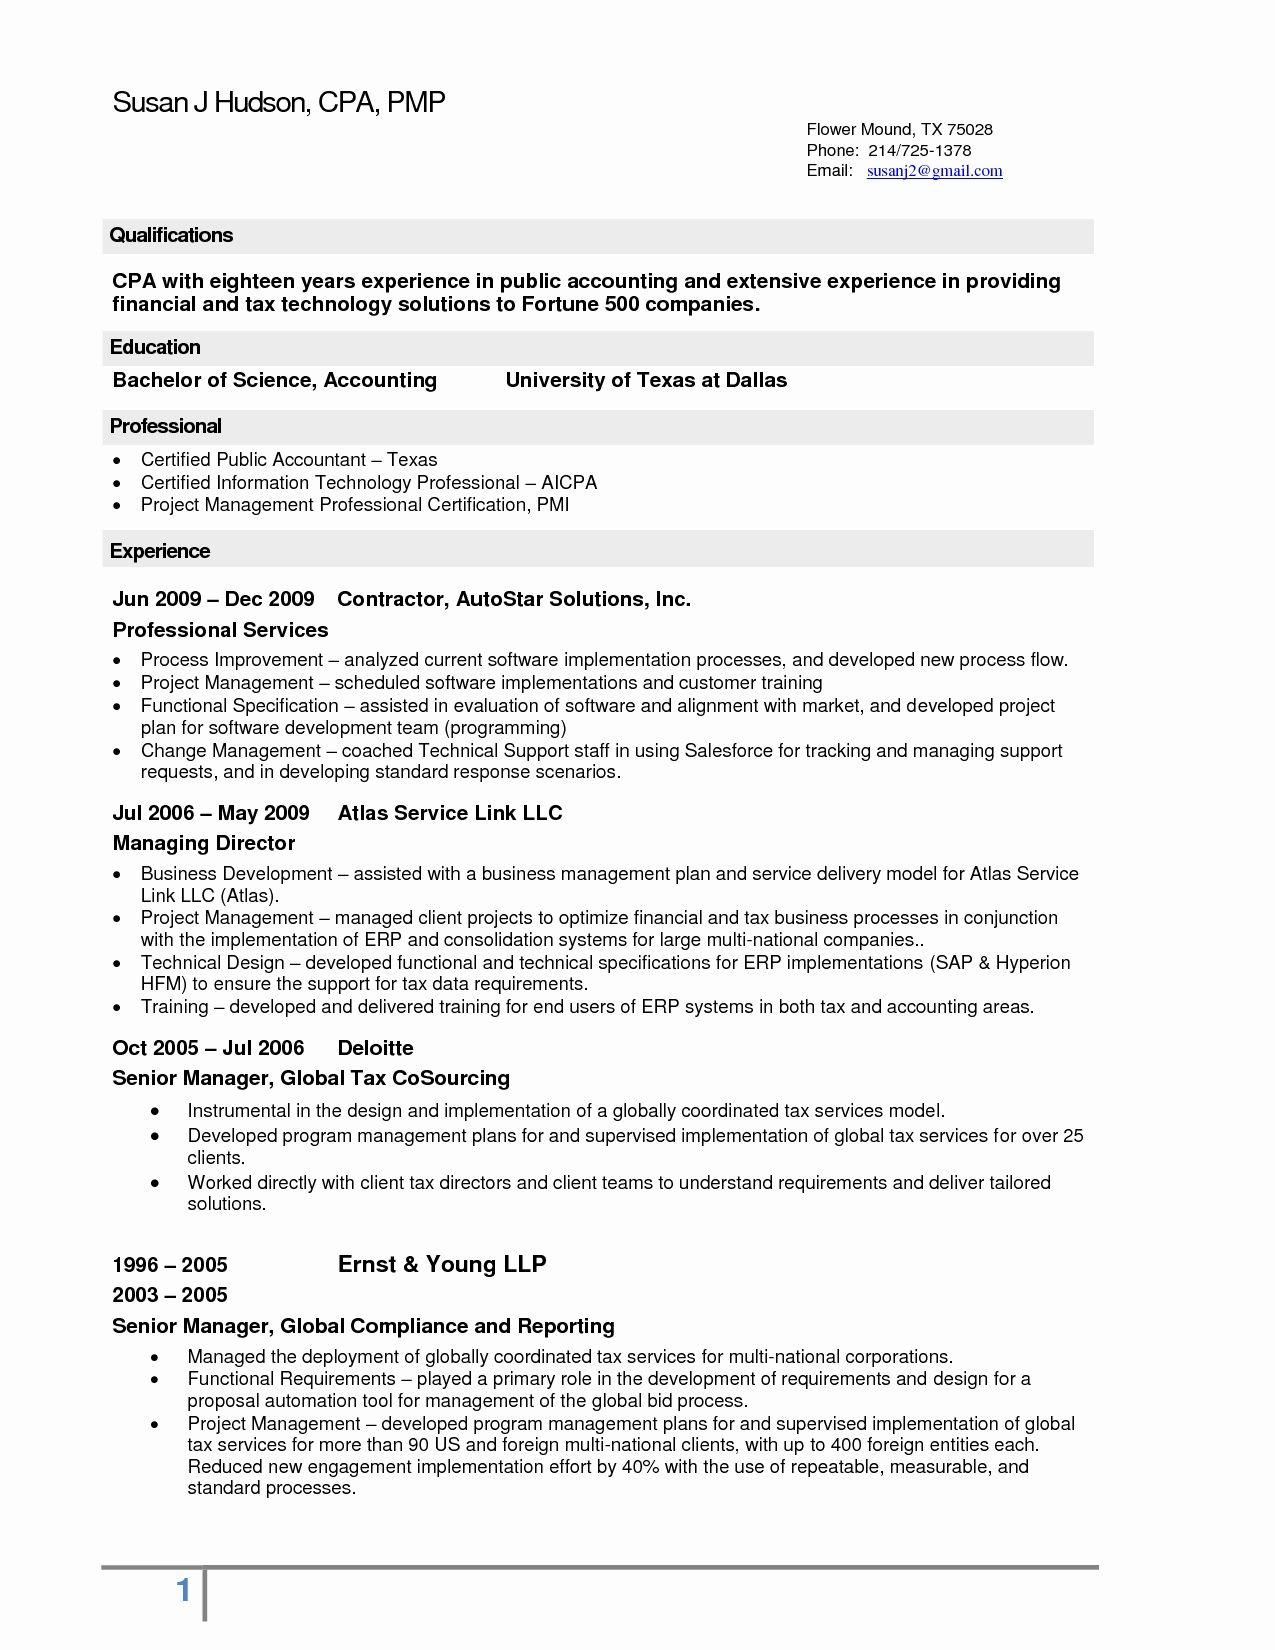 professional term paper ghostwriting site gb